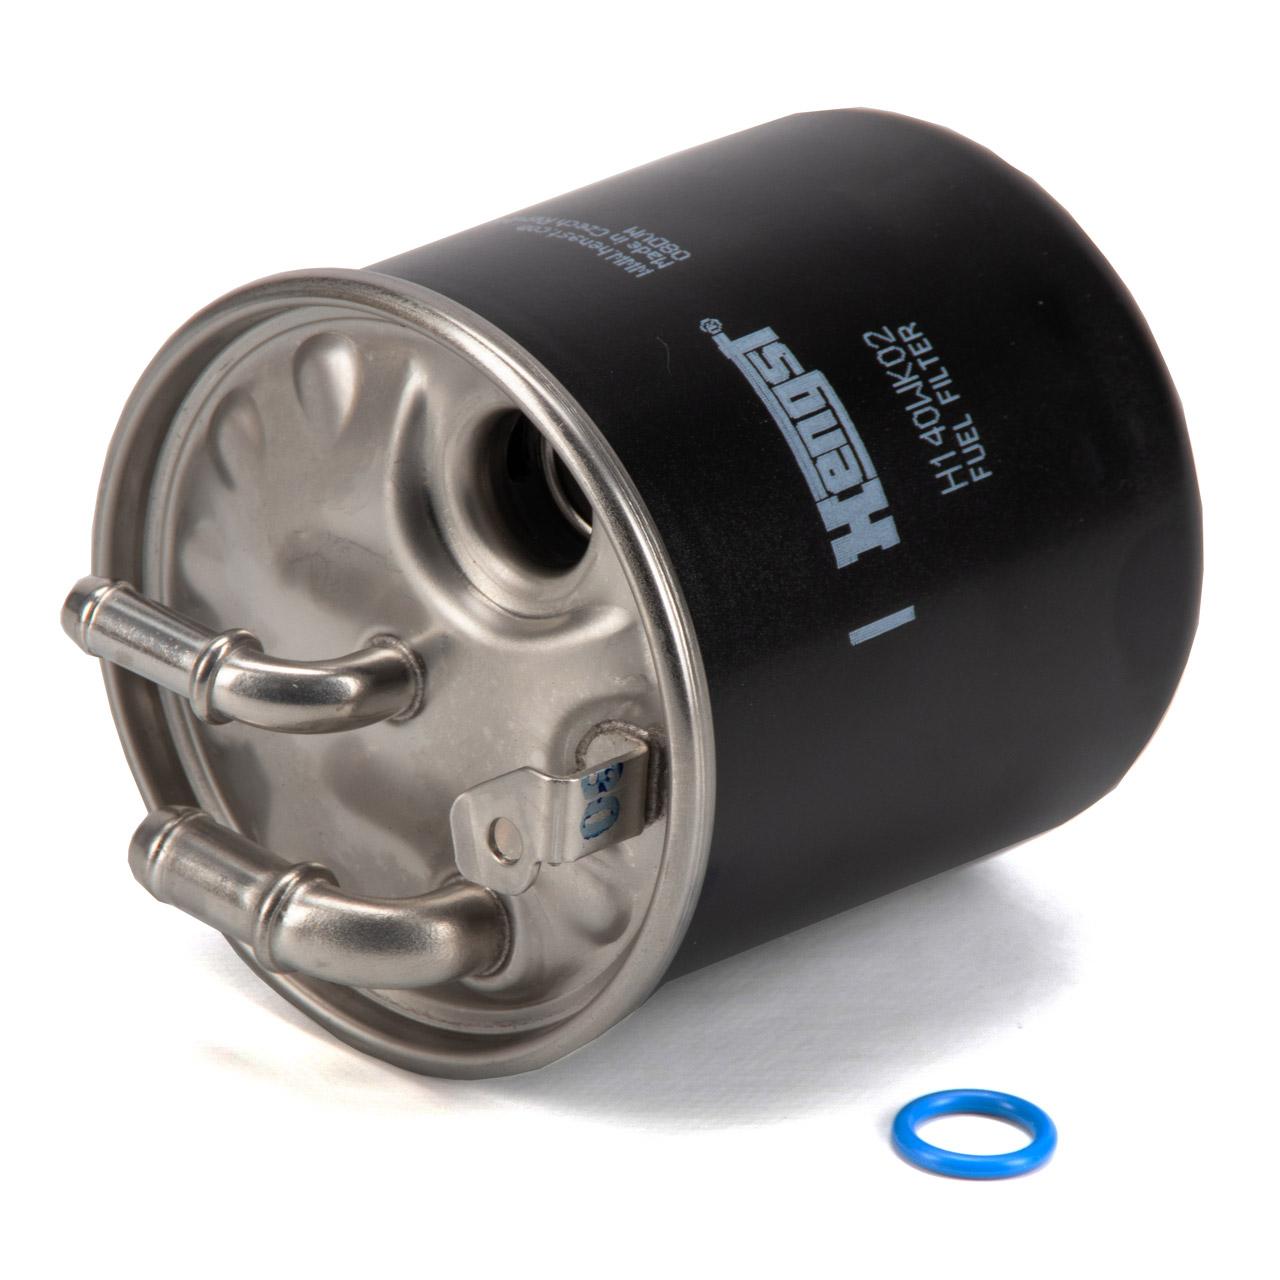 Inspektionskit MERCEDES Sprinter 906 10CDI 13CDI 16CDI 95-163 PS OM651